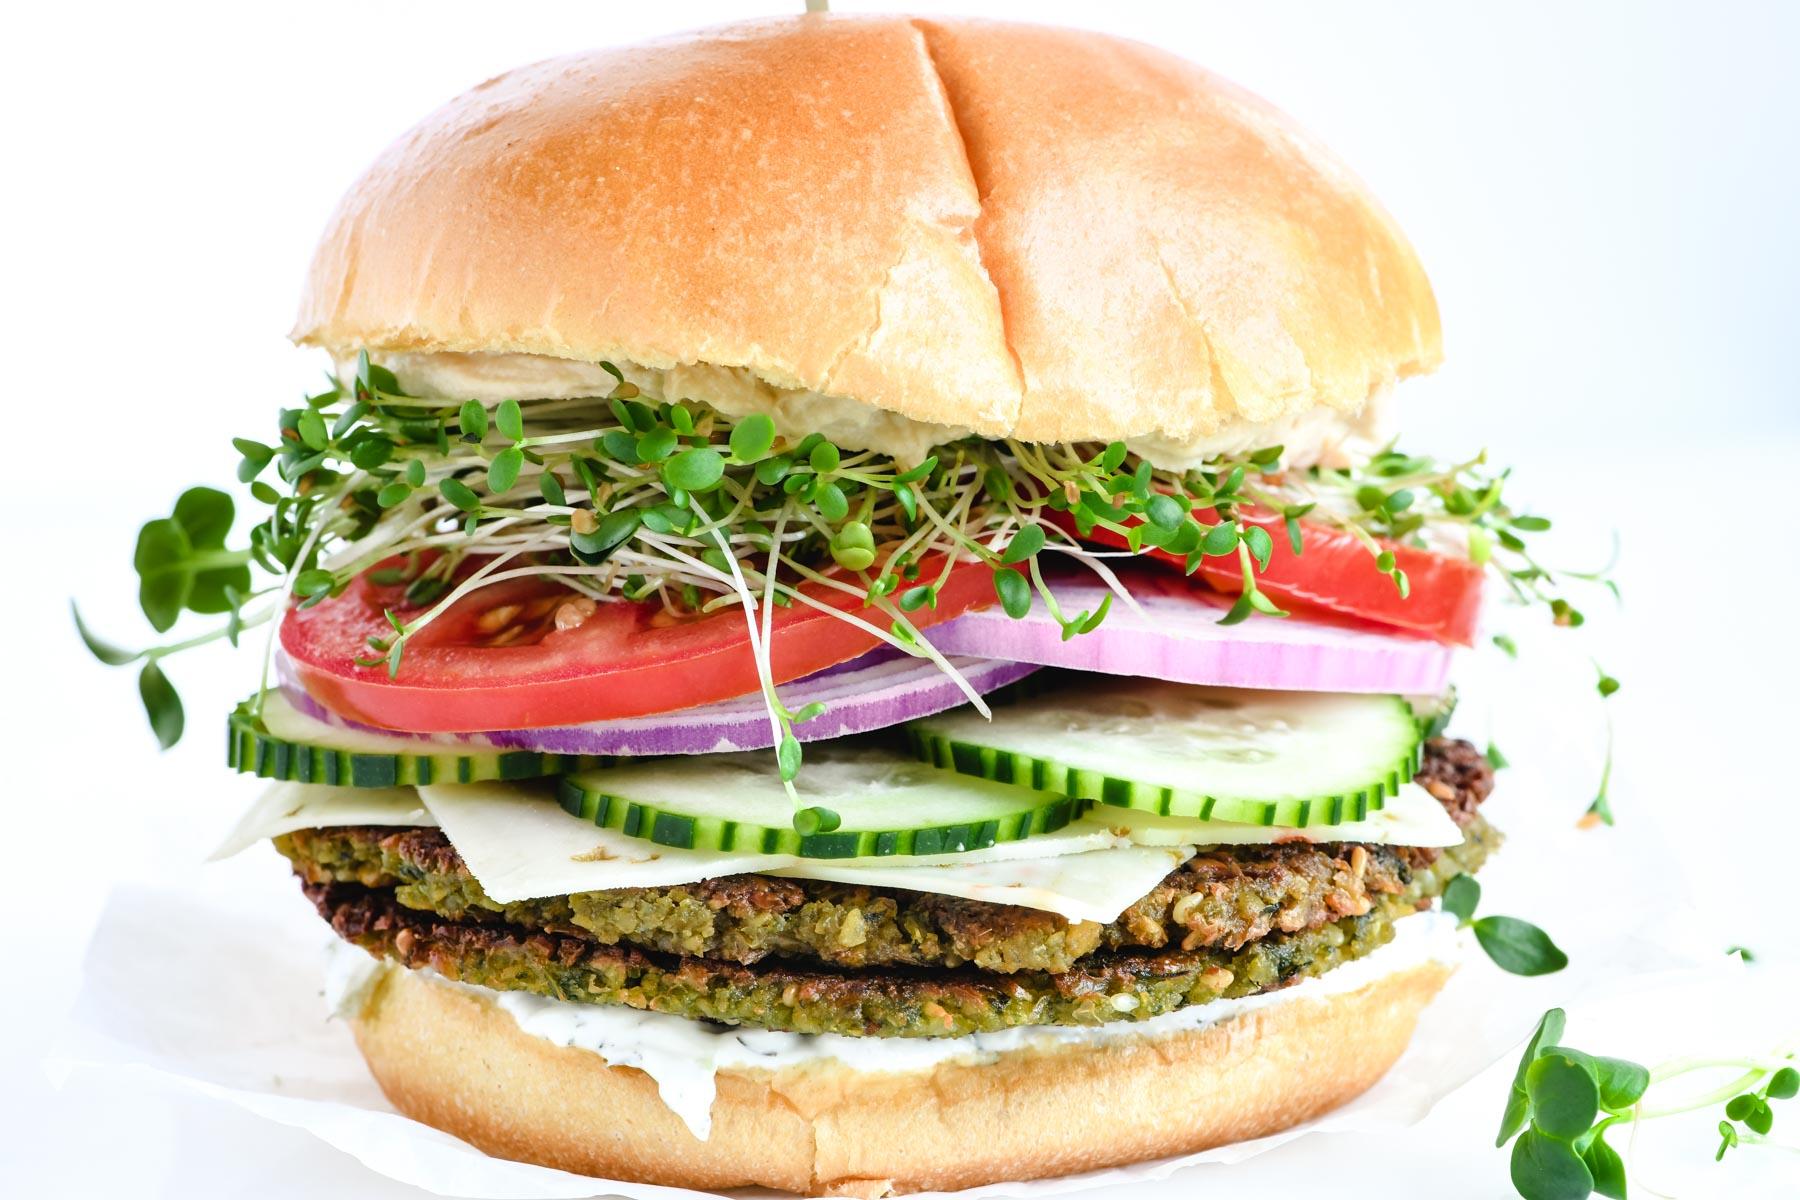 falafel burger with the works